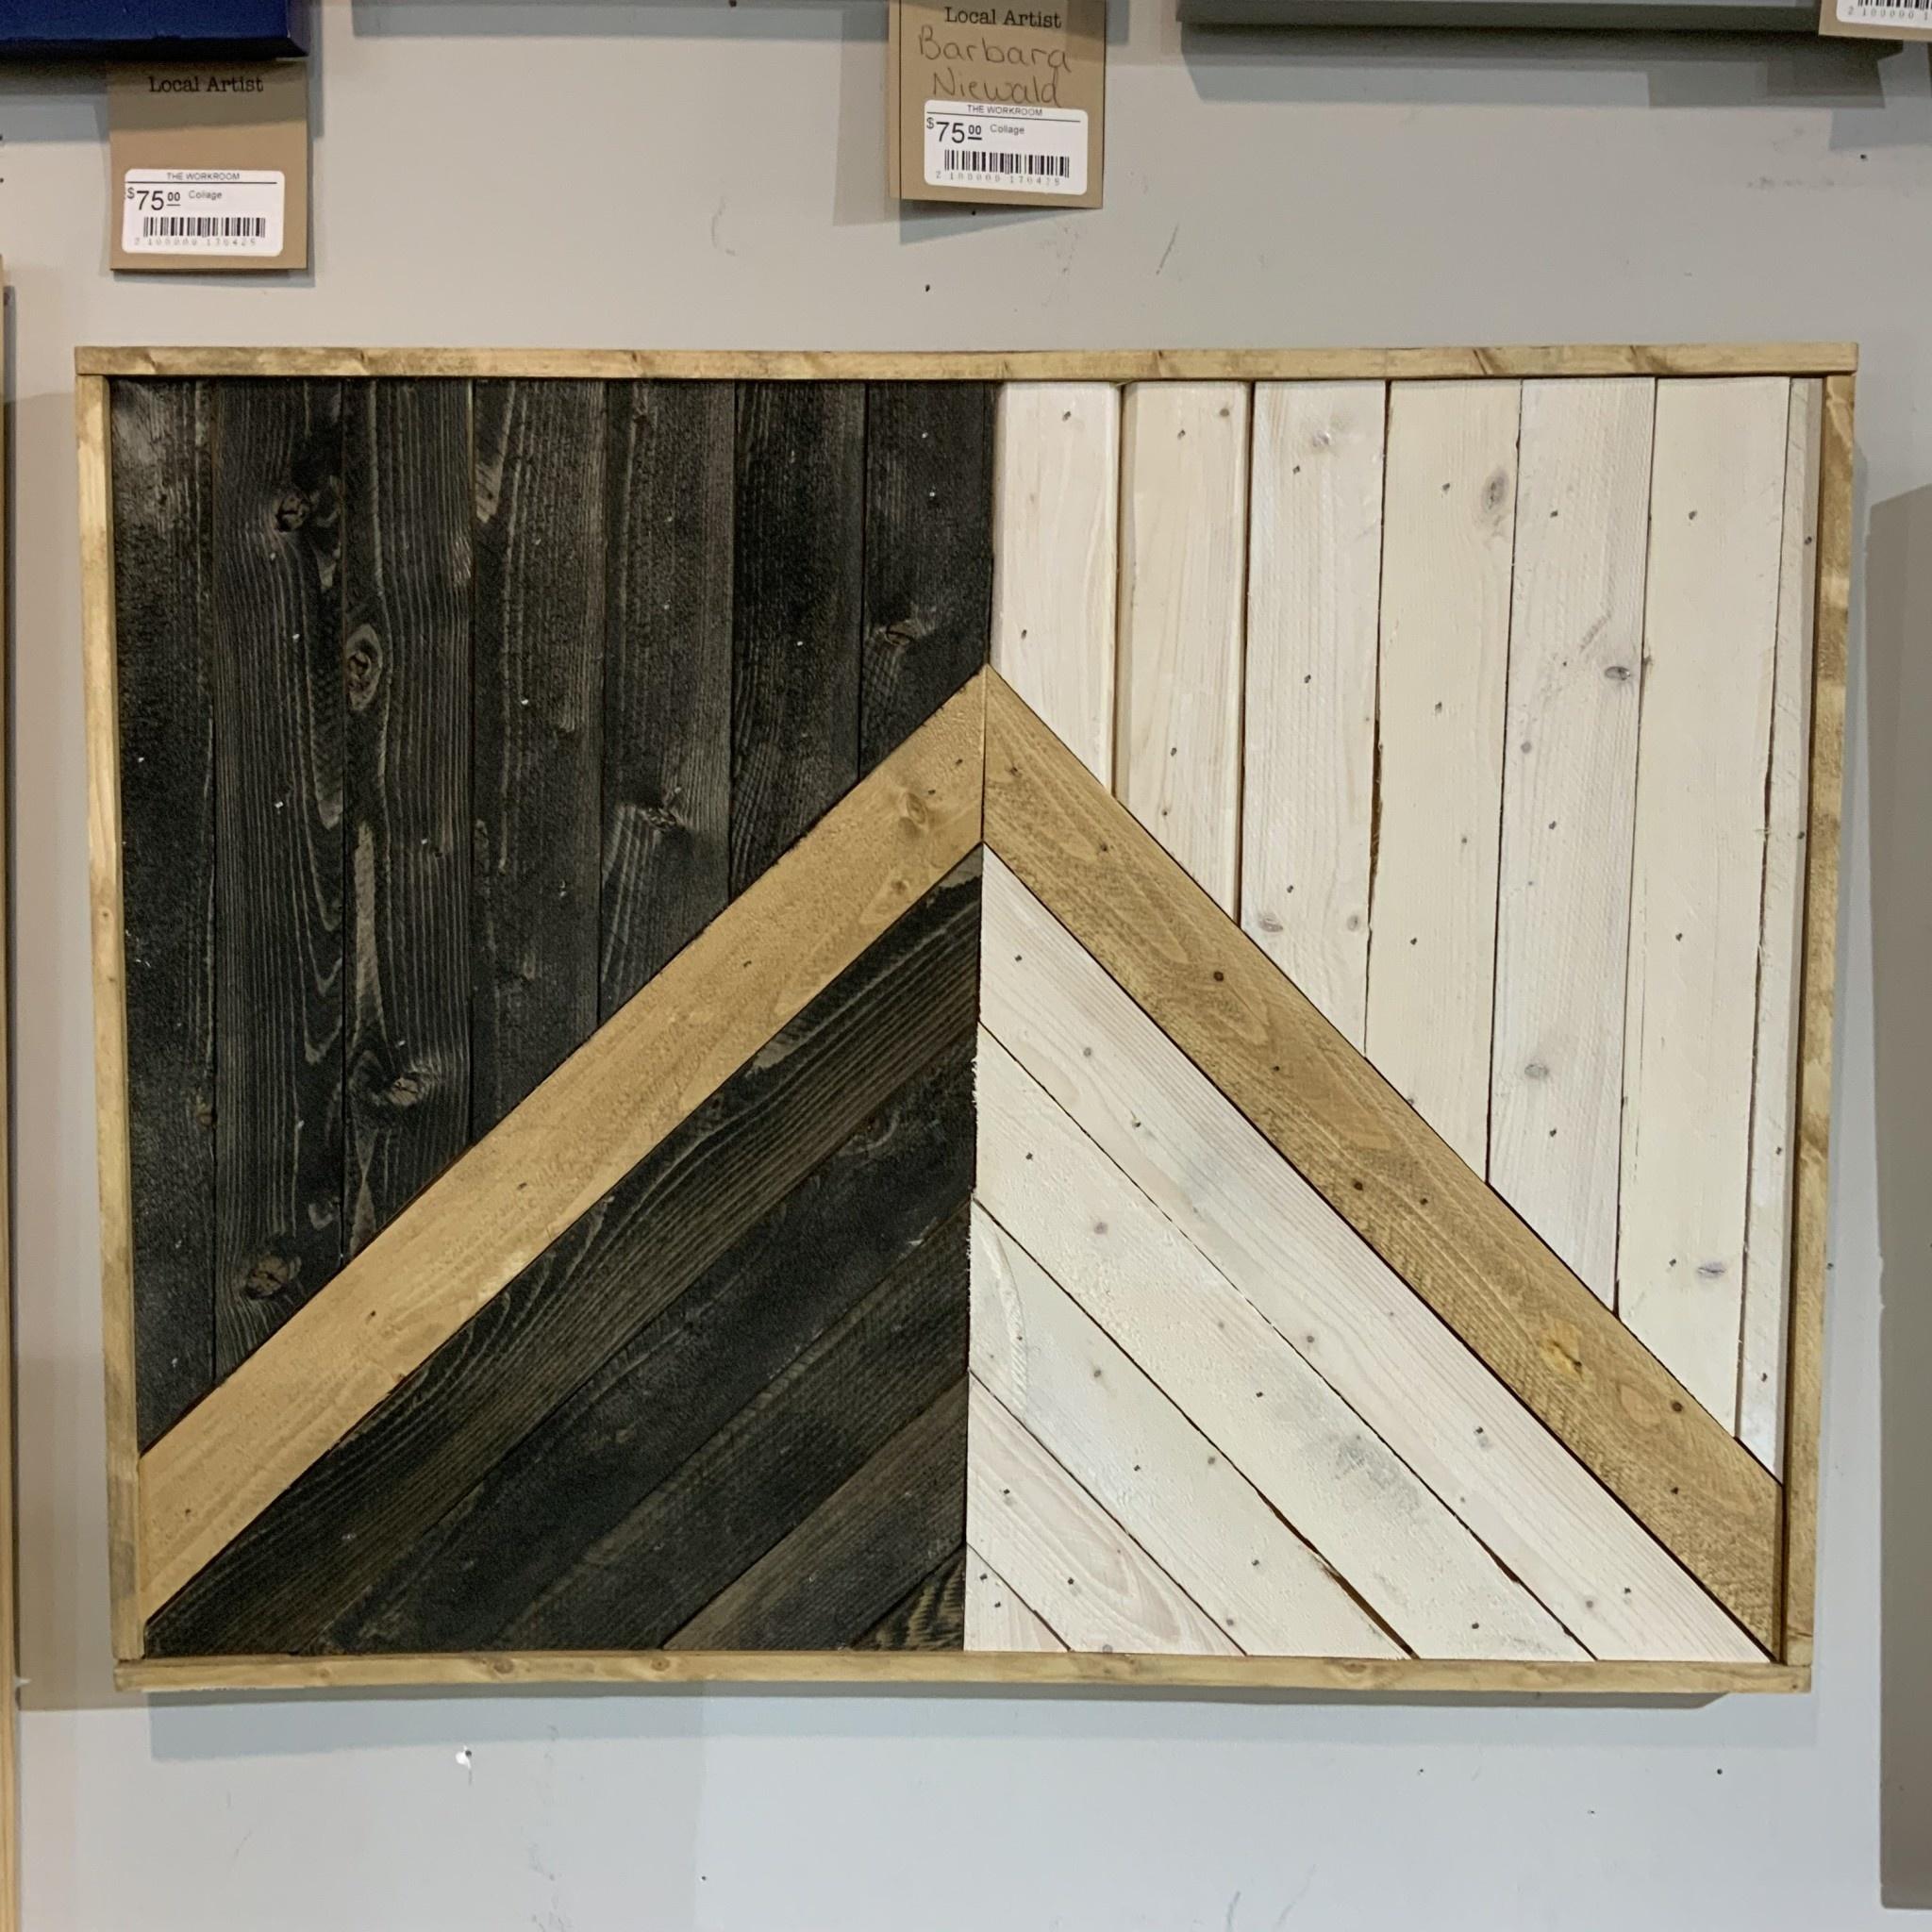 Glacier Wood Design Co GWD Co Good vs. Evil-B&W